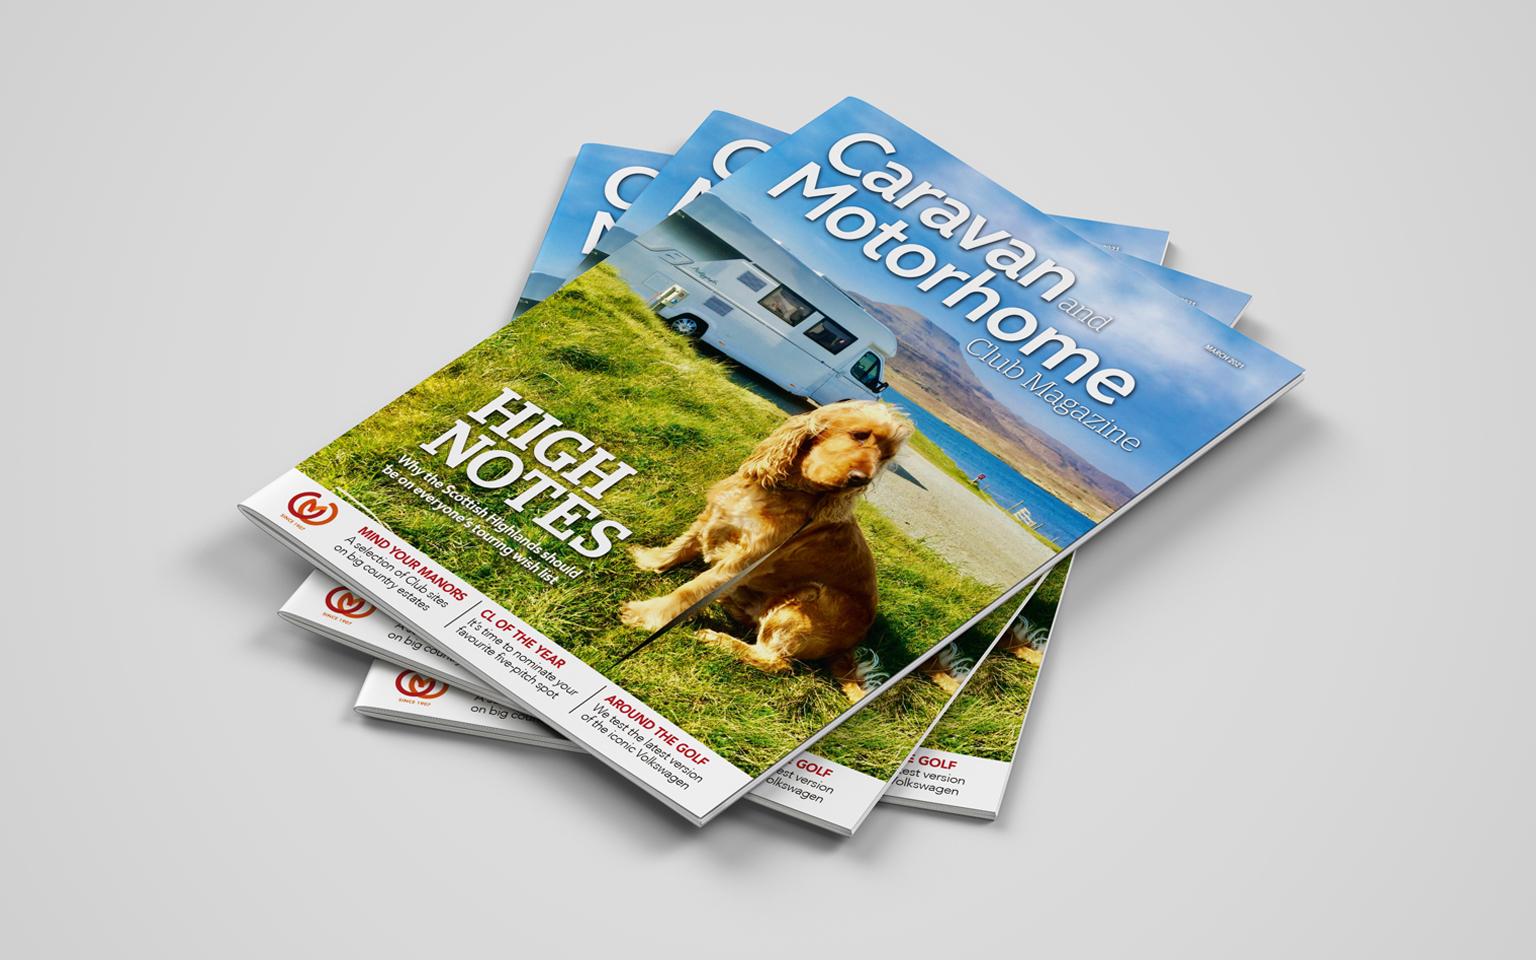 Caravan and Motorhome Club Magazine